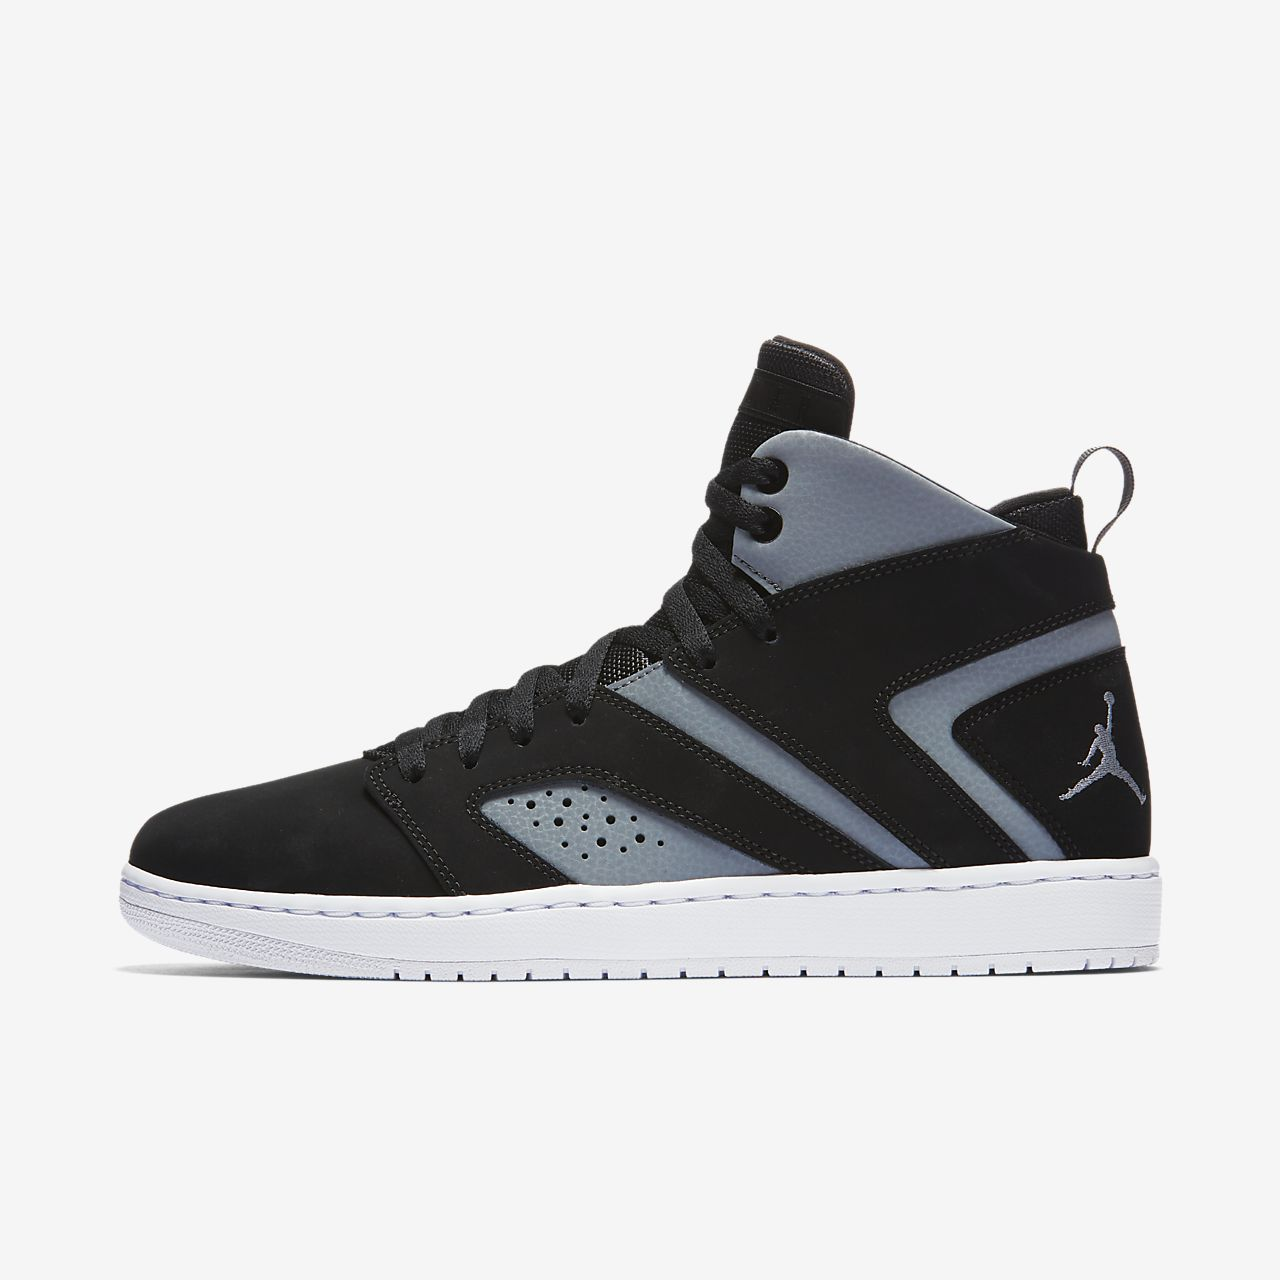 Nike Jordan Uomo Flight Legend Sneaker zPqTxFOq